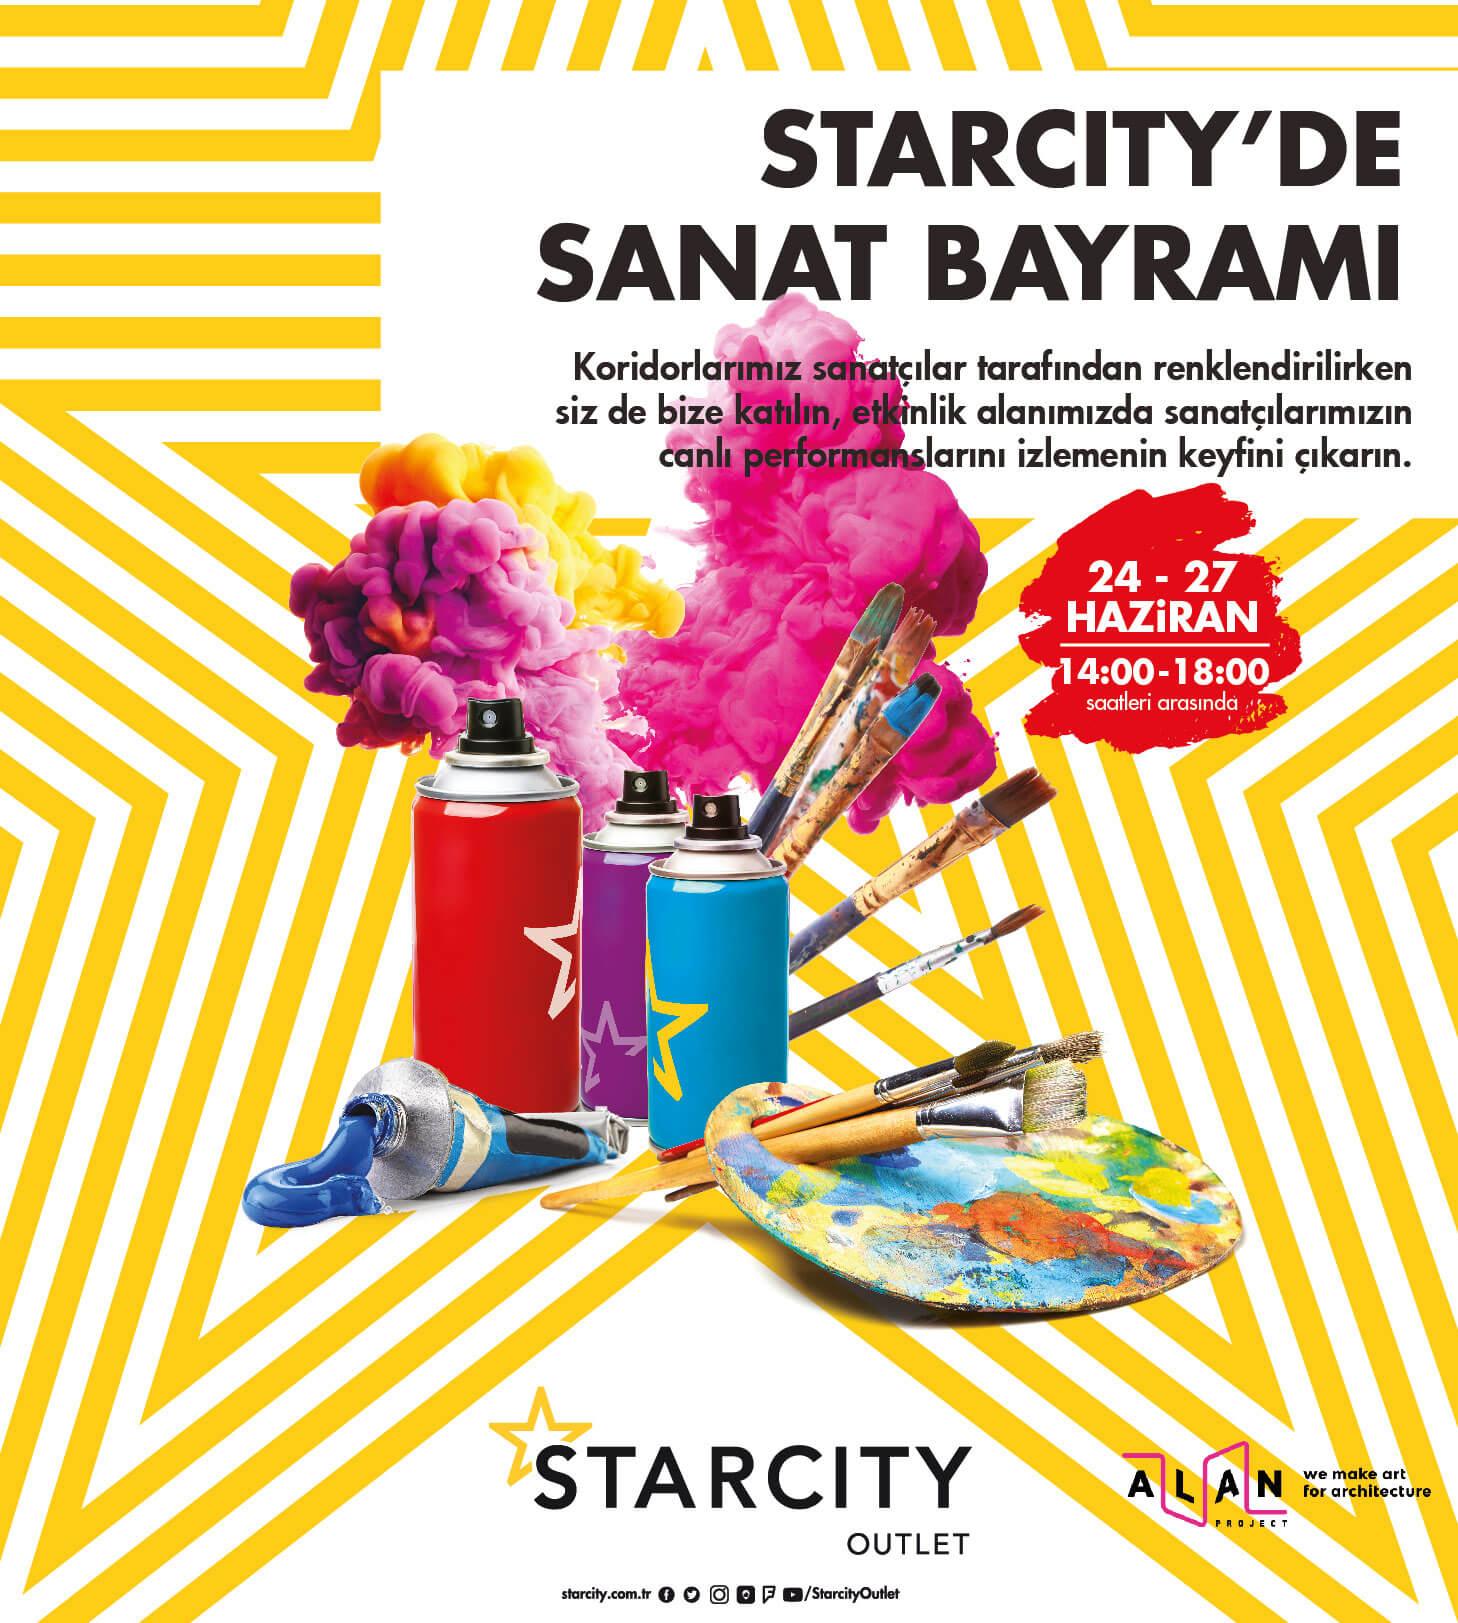 Starcity'de Sanat Bayramı